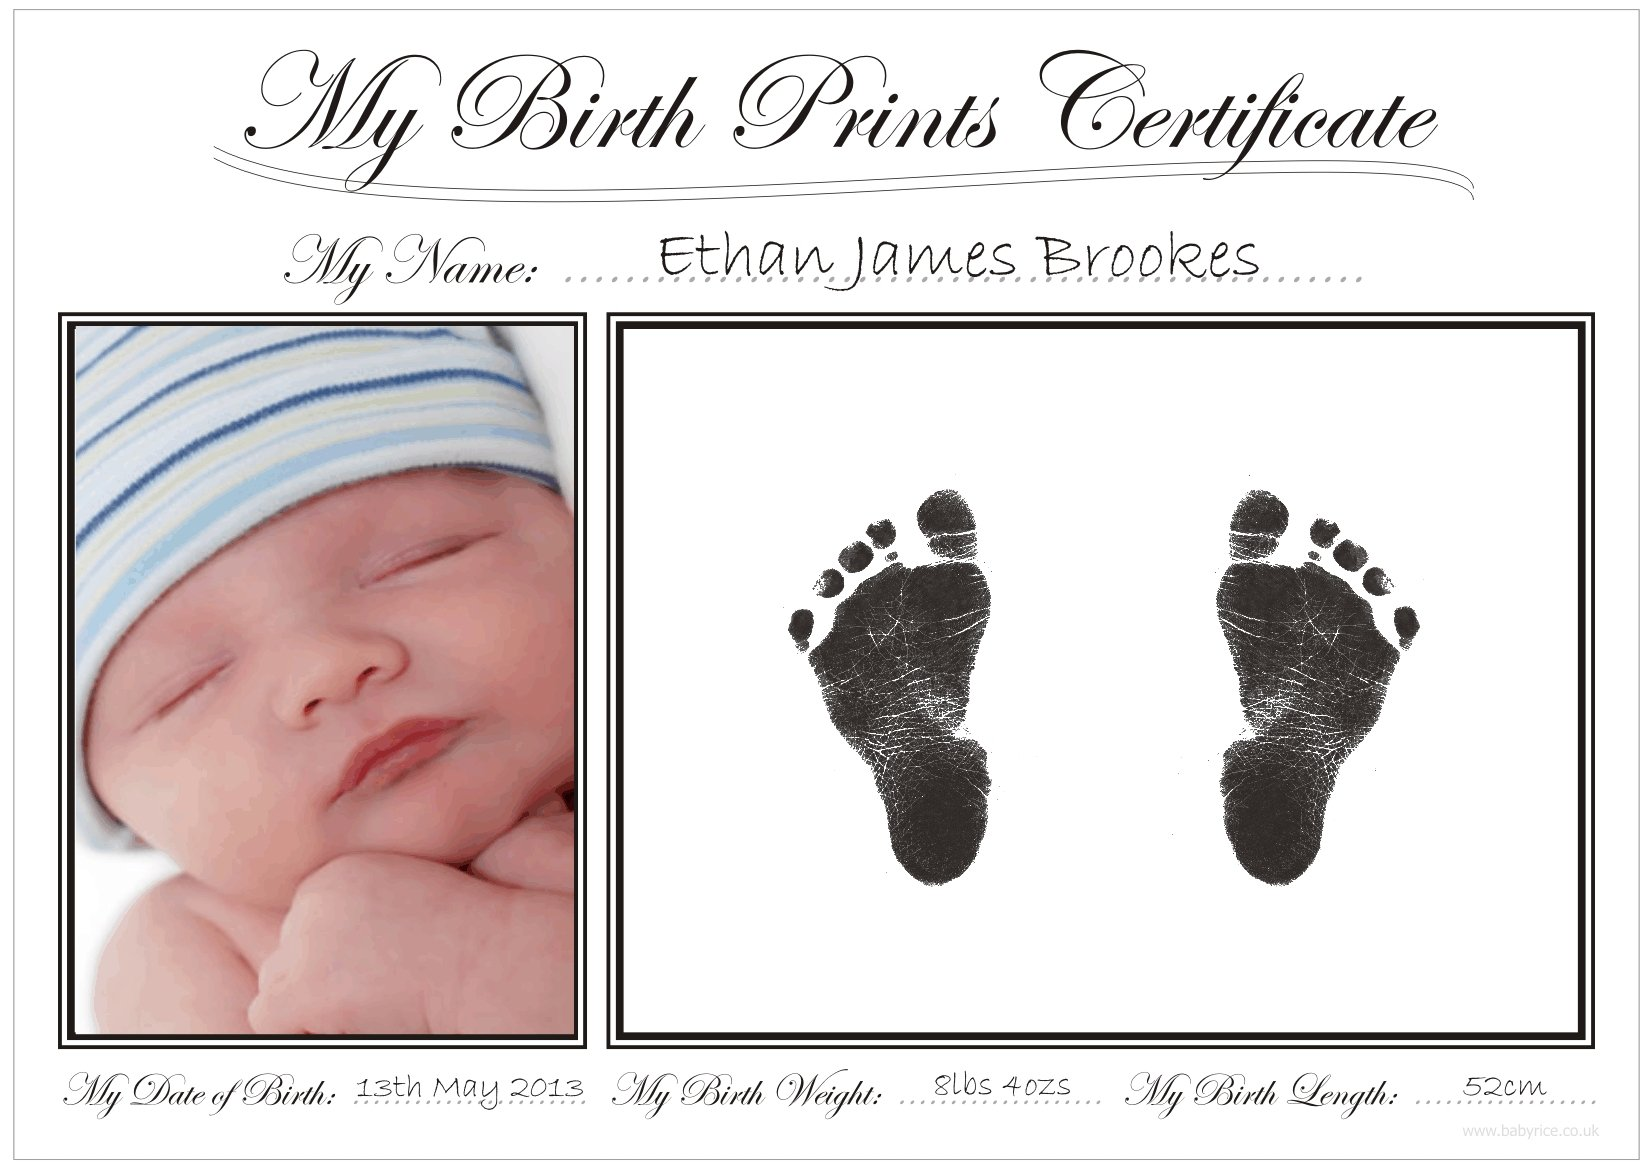 BabyRice New Baby Handprint & Footprint Certificate Kit / Boy Girl Unisex Birth Prints